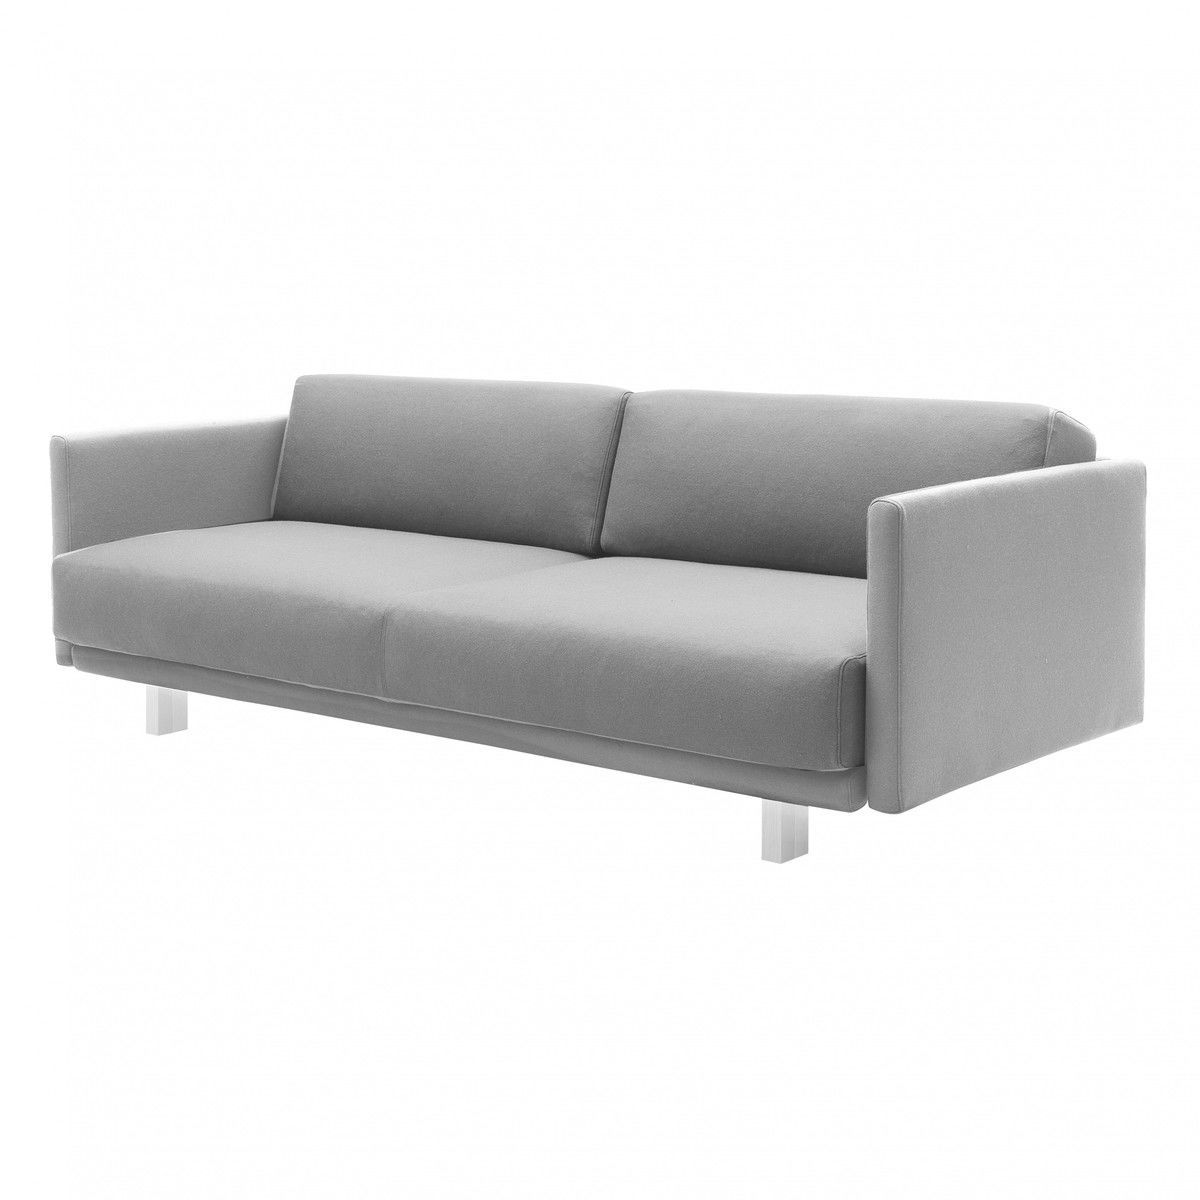 schlafsofa hellgrau m belideen. Black Bedroom Furniture Sets. Home Design Ideas